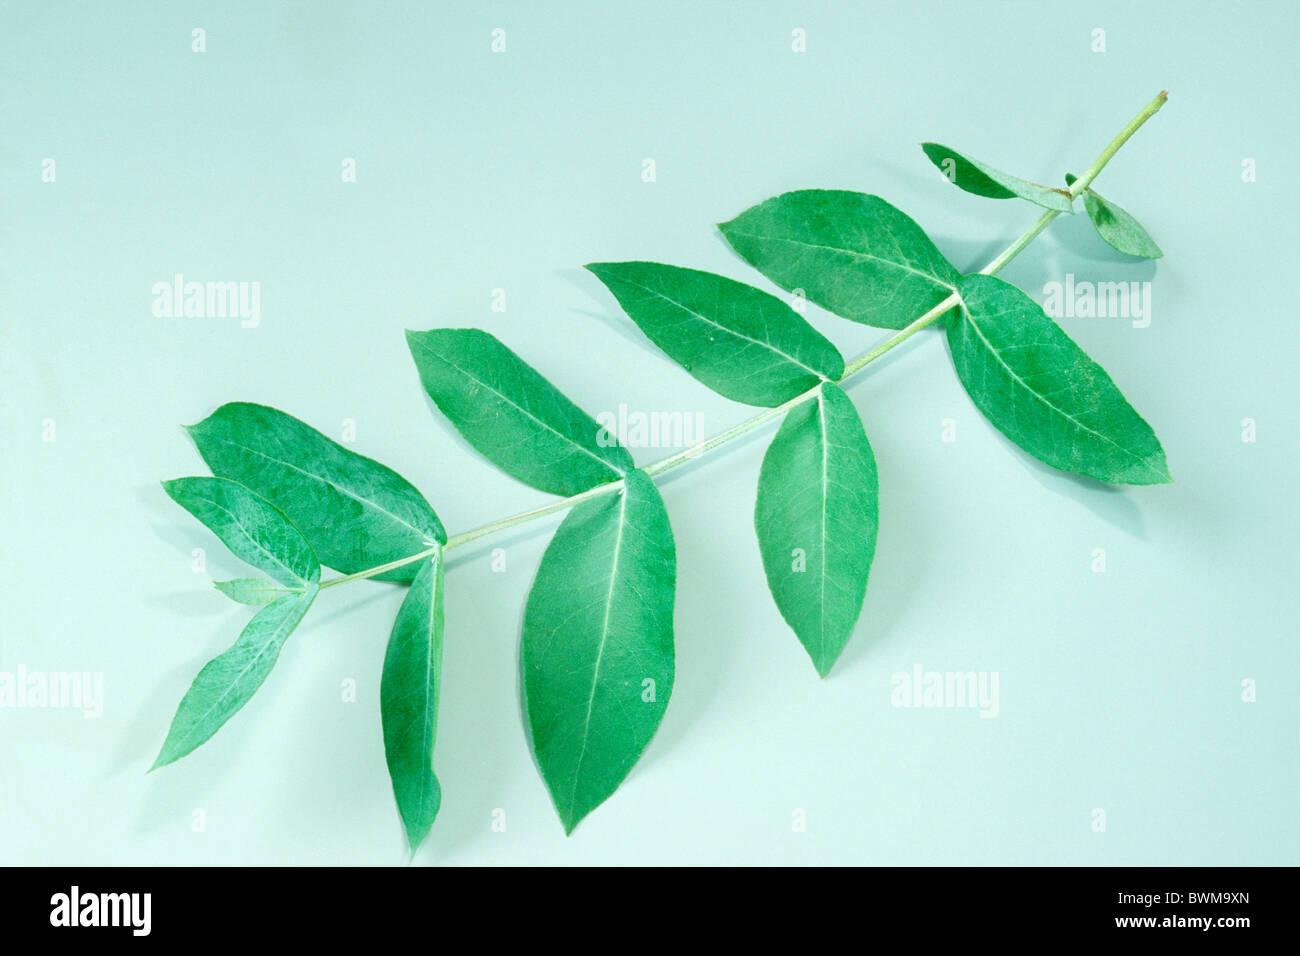 Tasmanian Blue Gum, Blue Gum Eucalyptus (Eucalyptus globulus), twig with leaves, studio picture. - Stock Image